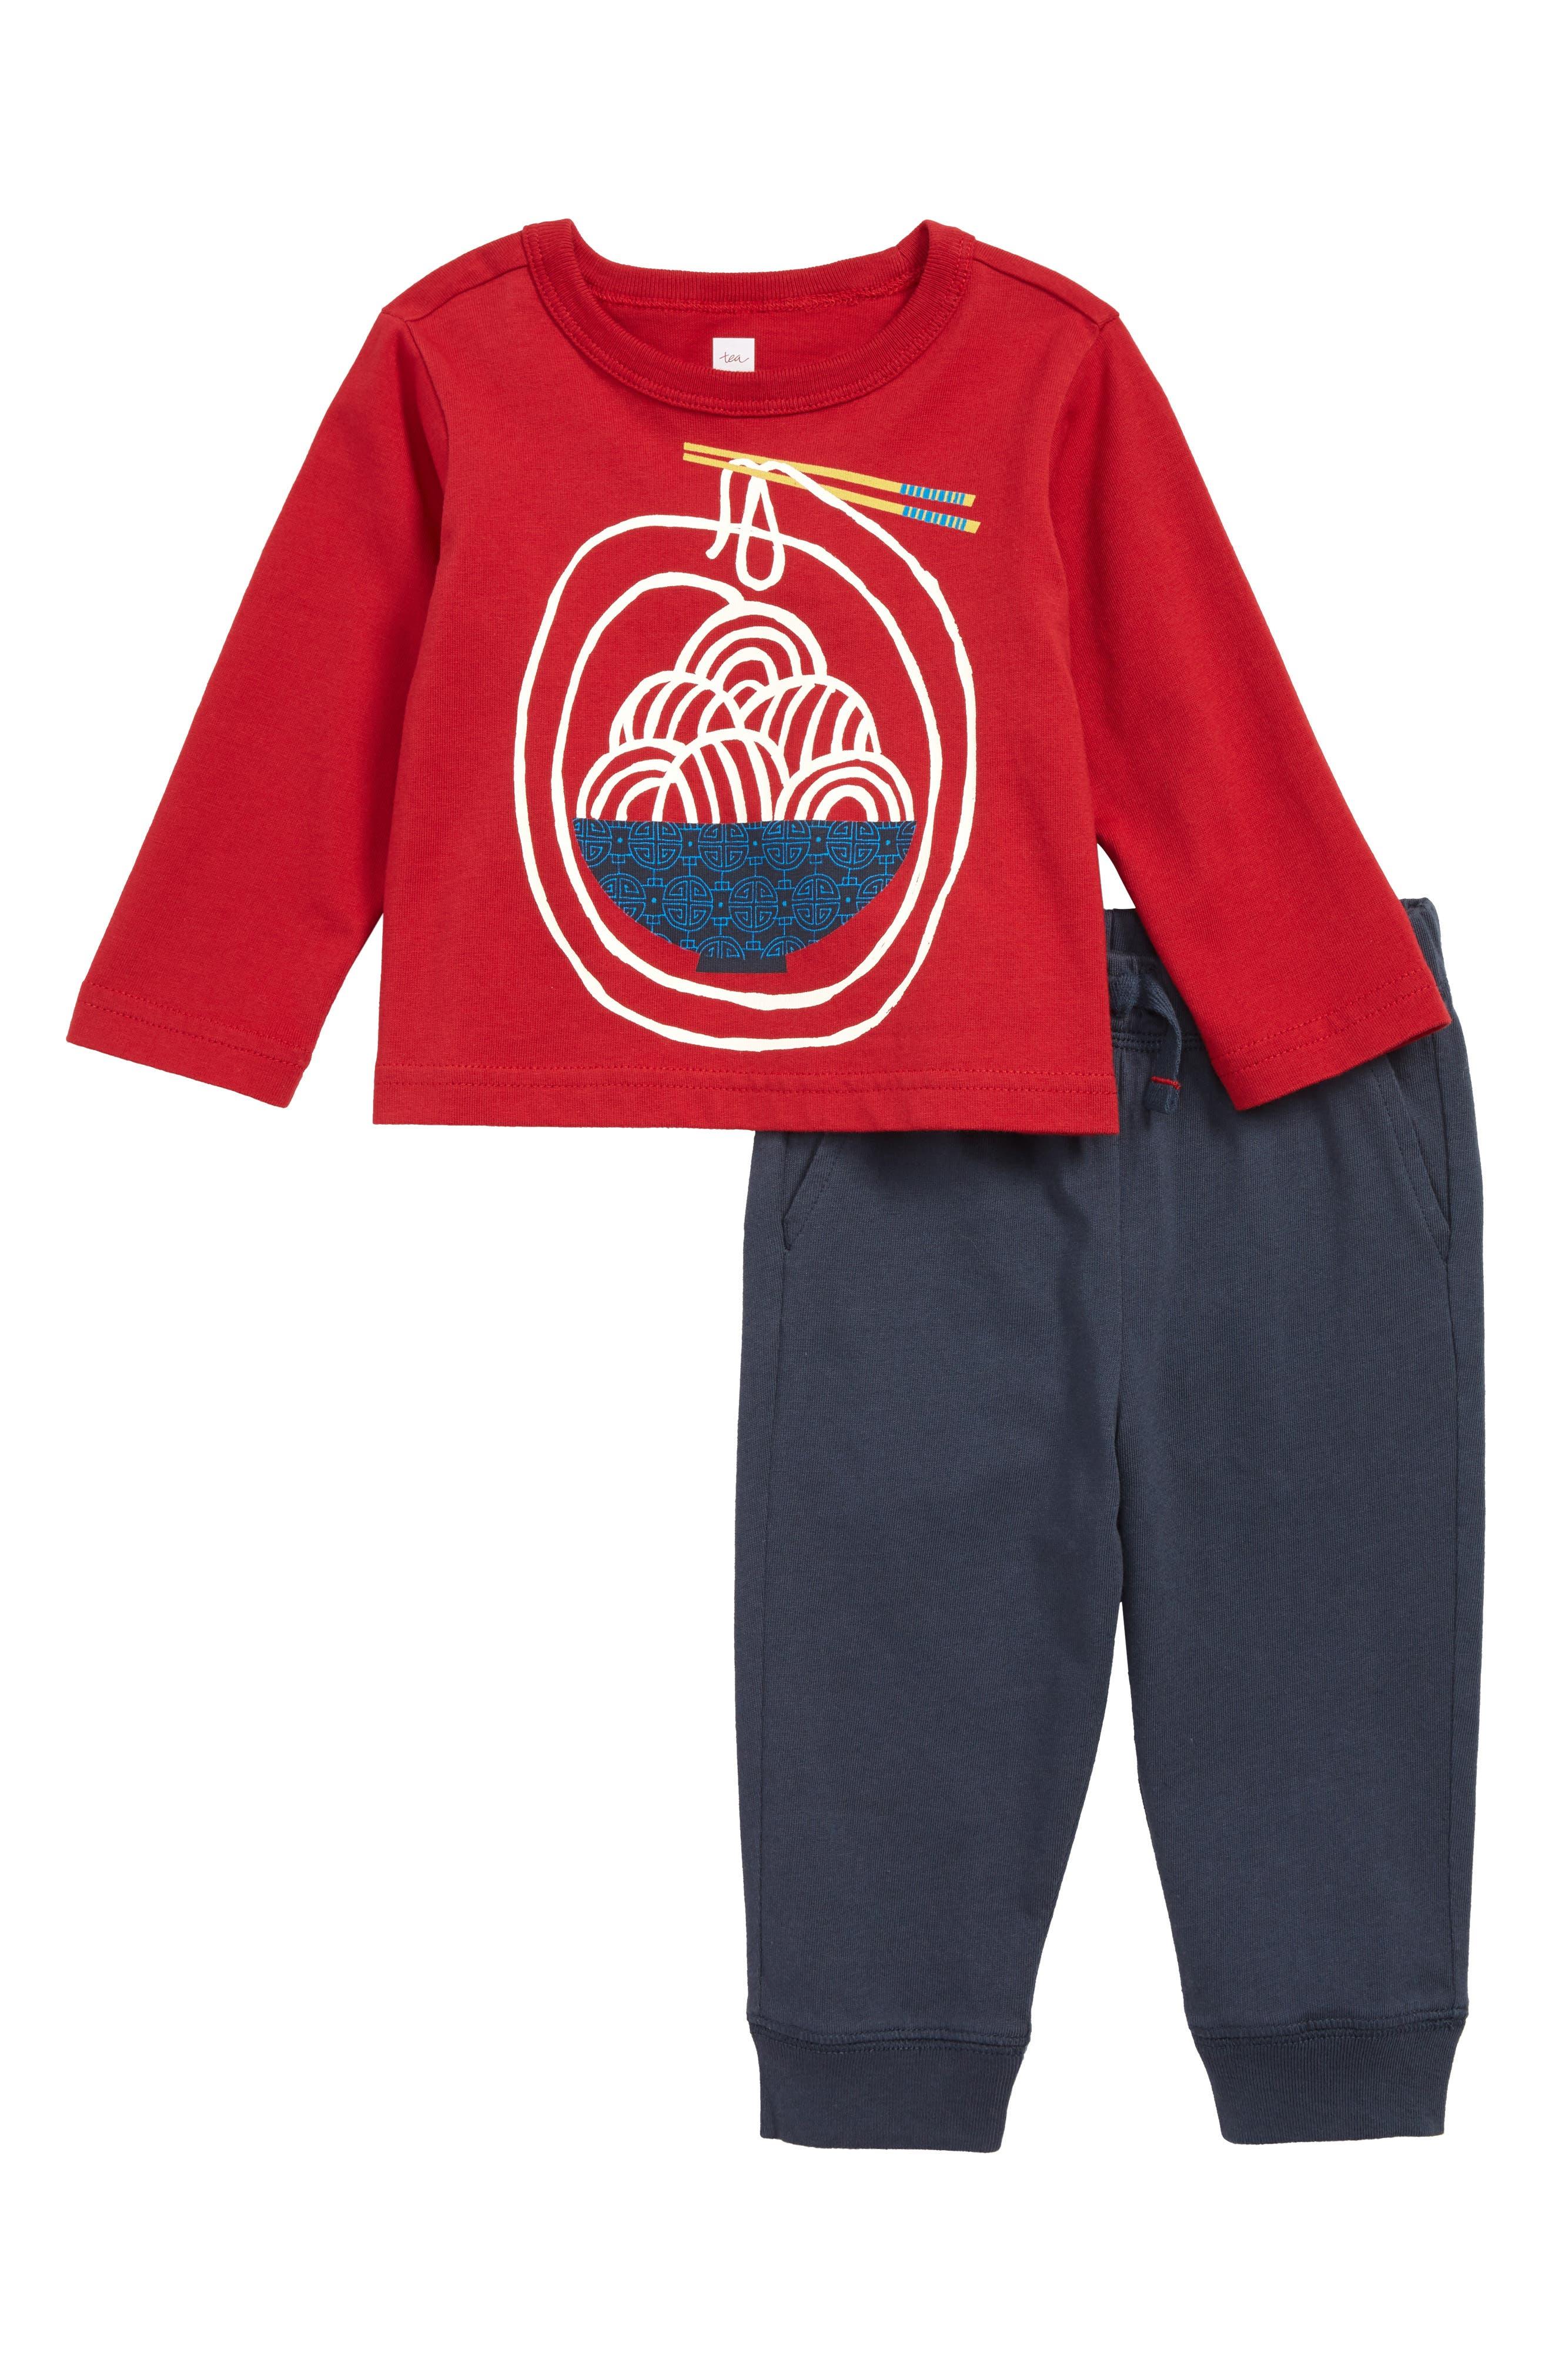 Infant Boys Tea Collection Noodling Around TShirt  Sweatpants Set